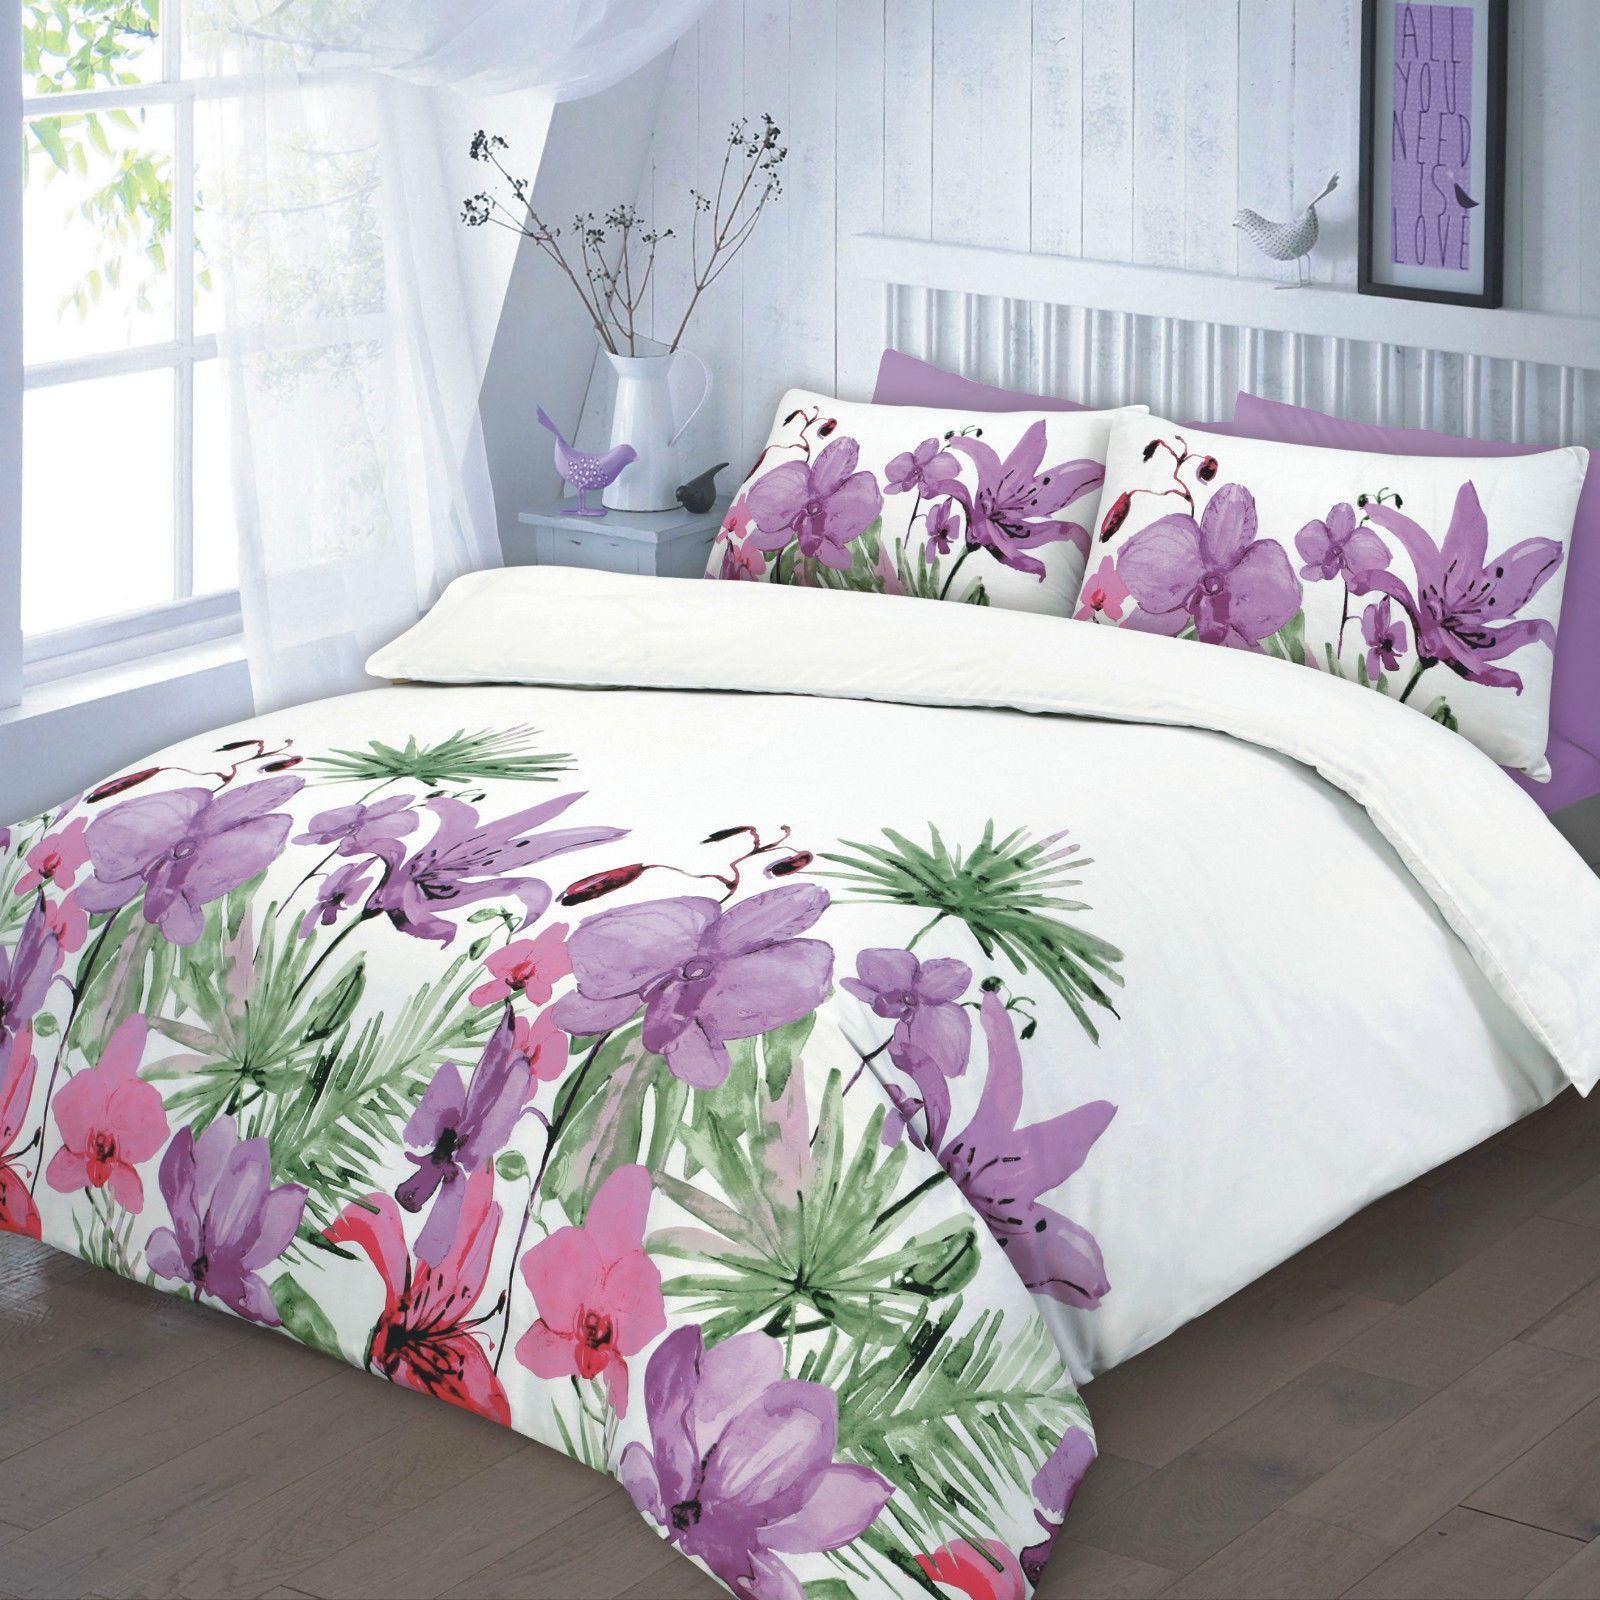 Lily Floral Duvet Quilt Bedding Set Lilac Linens Range